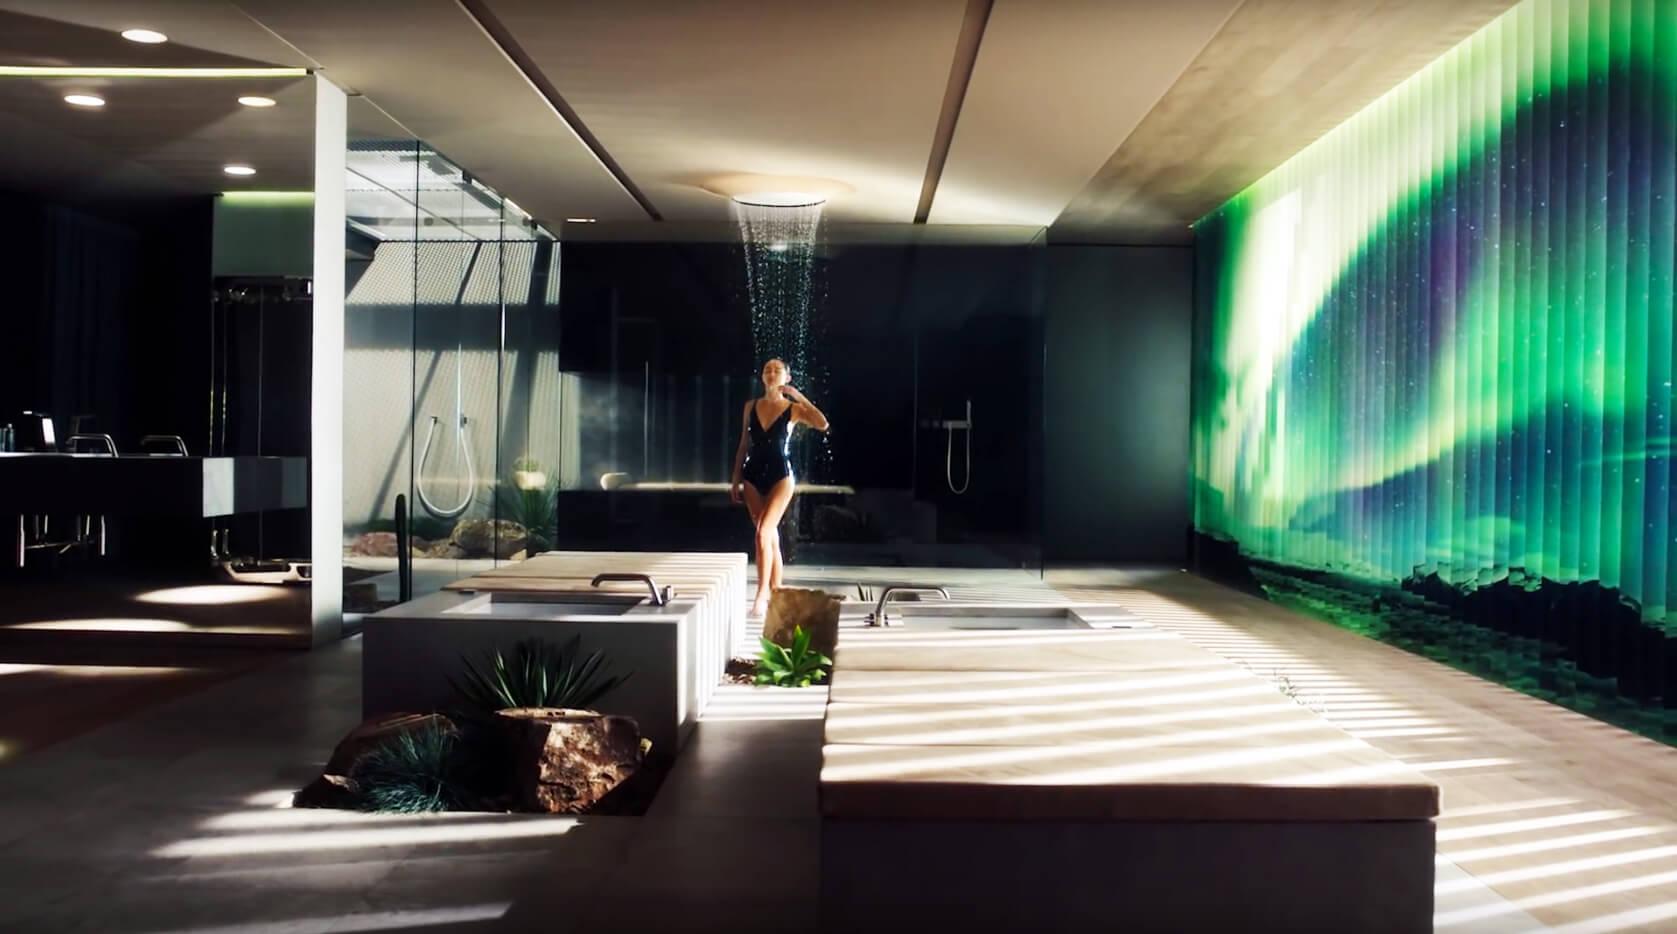 smart home im badezimmer design smart home im bad, Badezimmer ideen